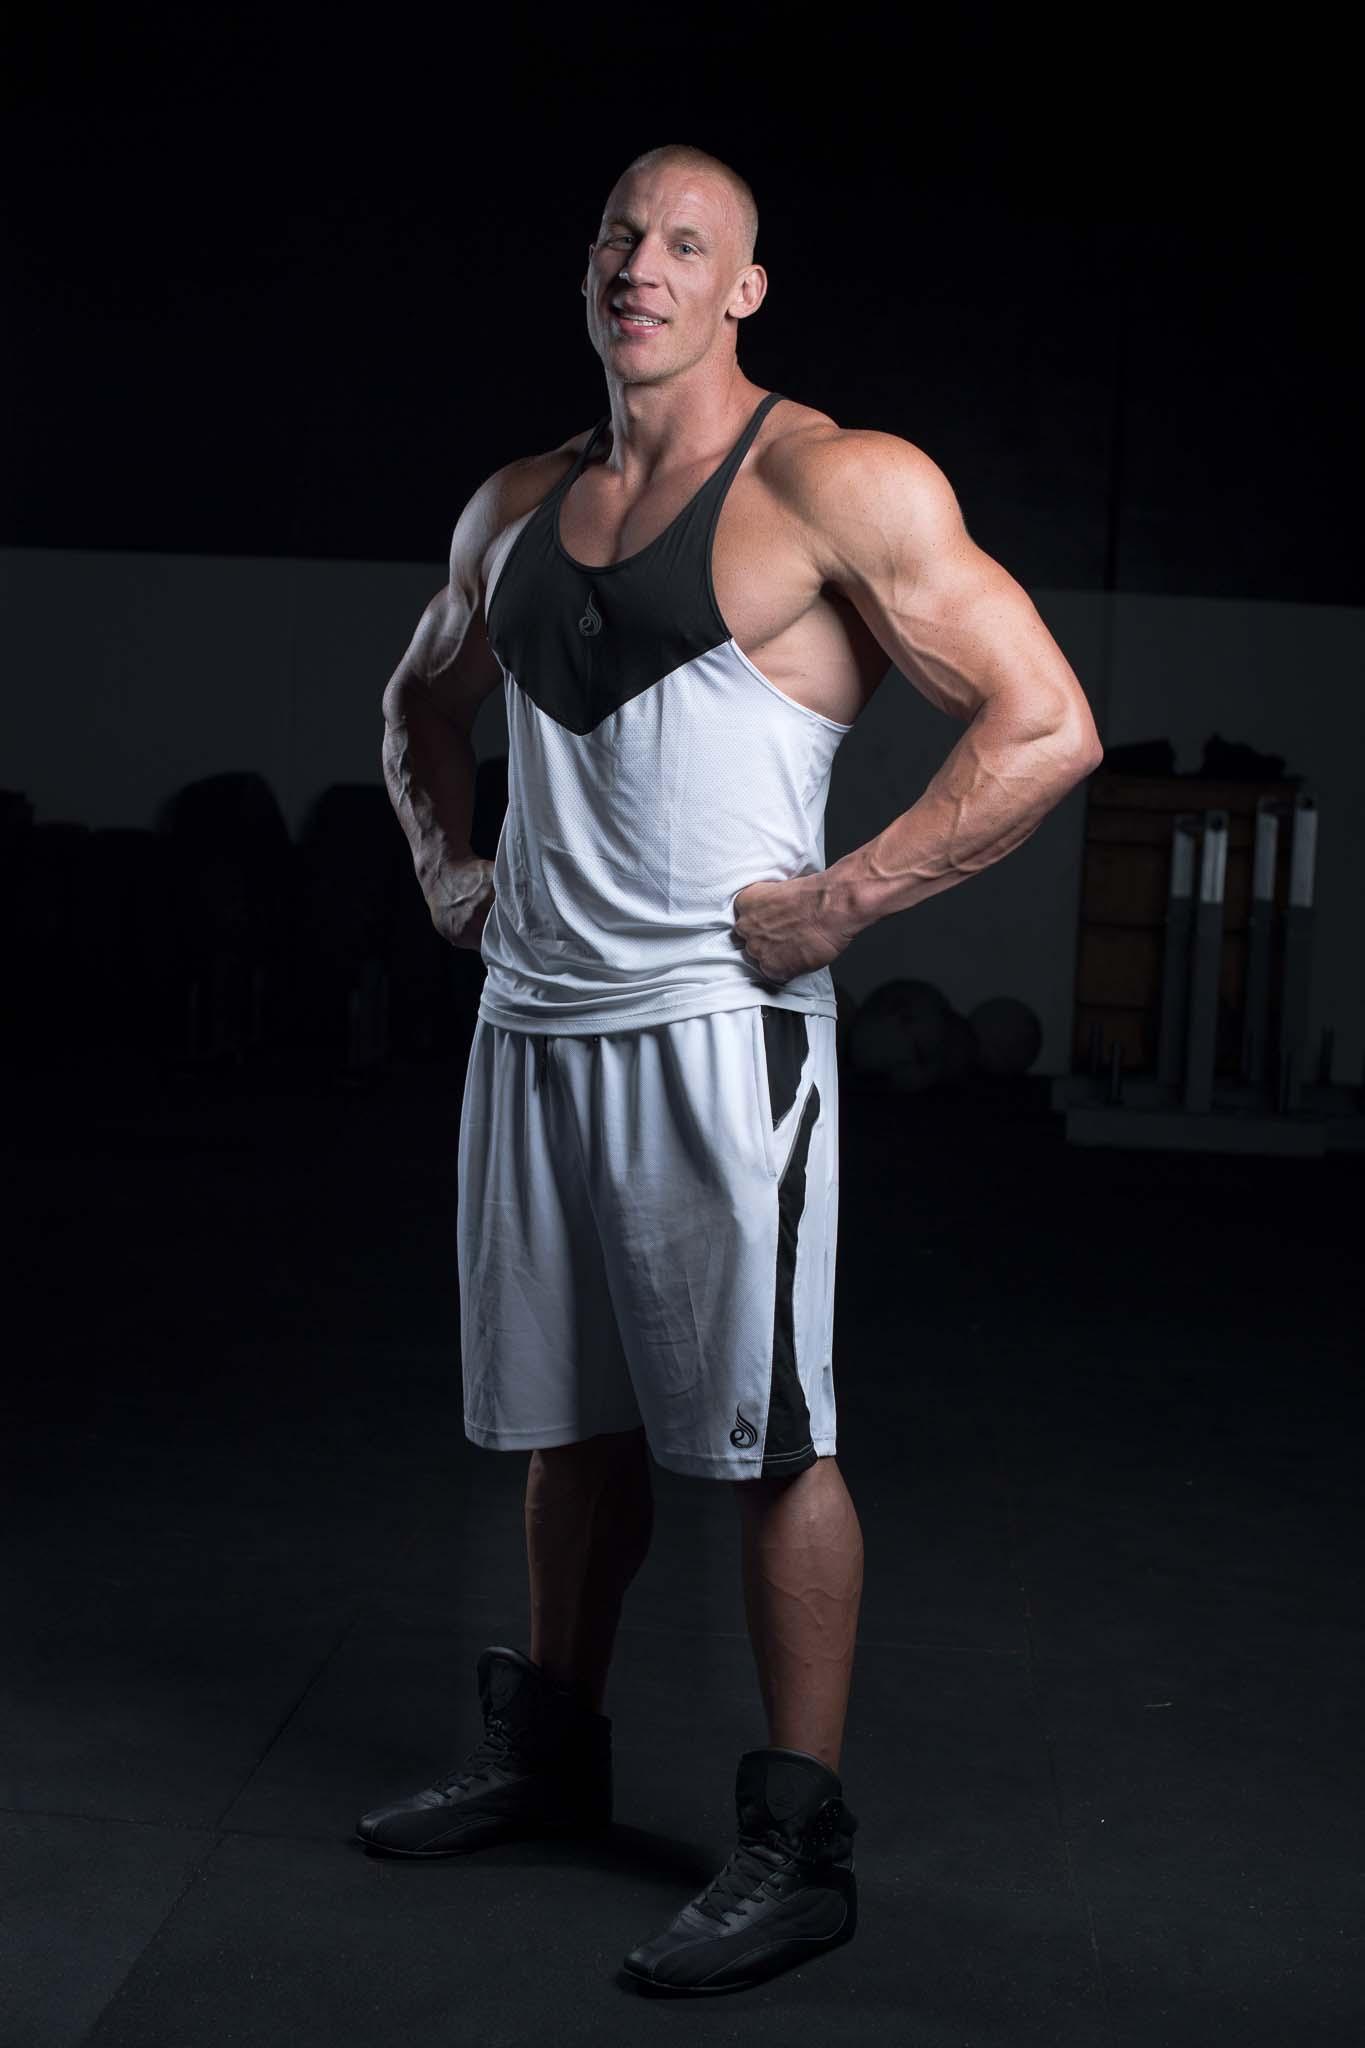 Keagan Melbourne's strongman athlete